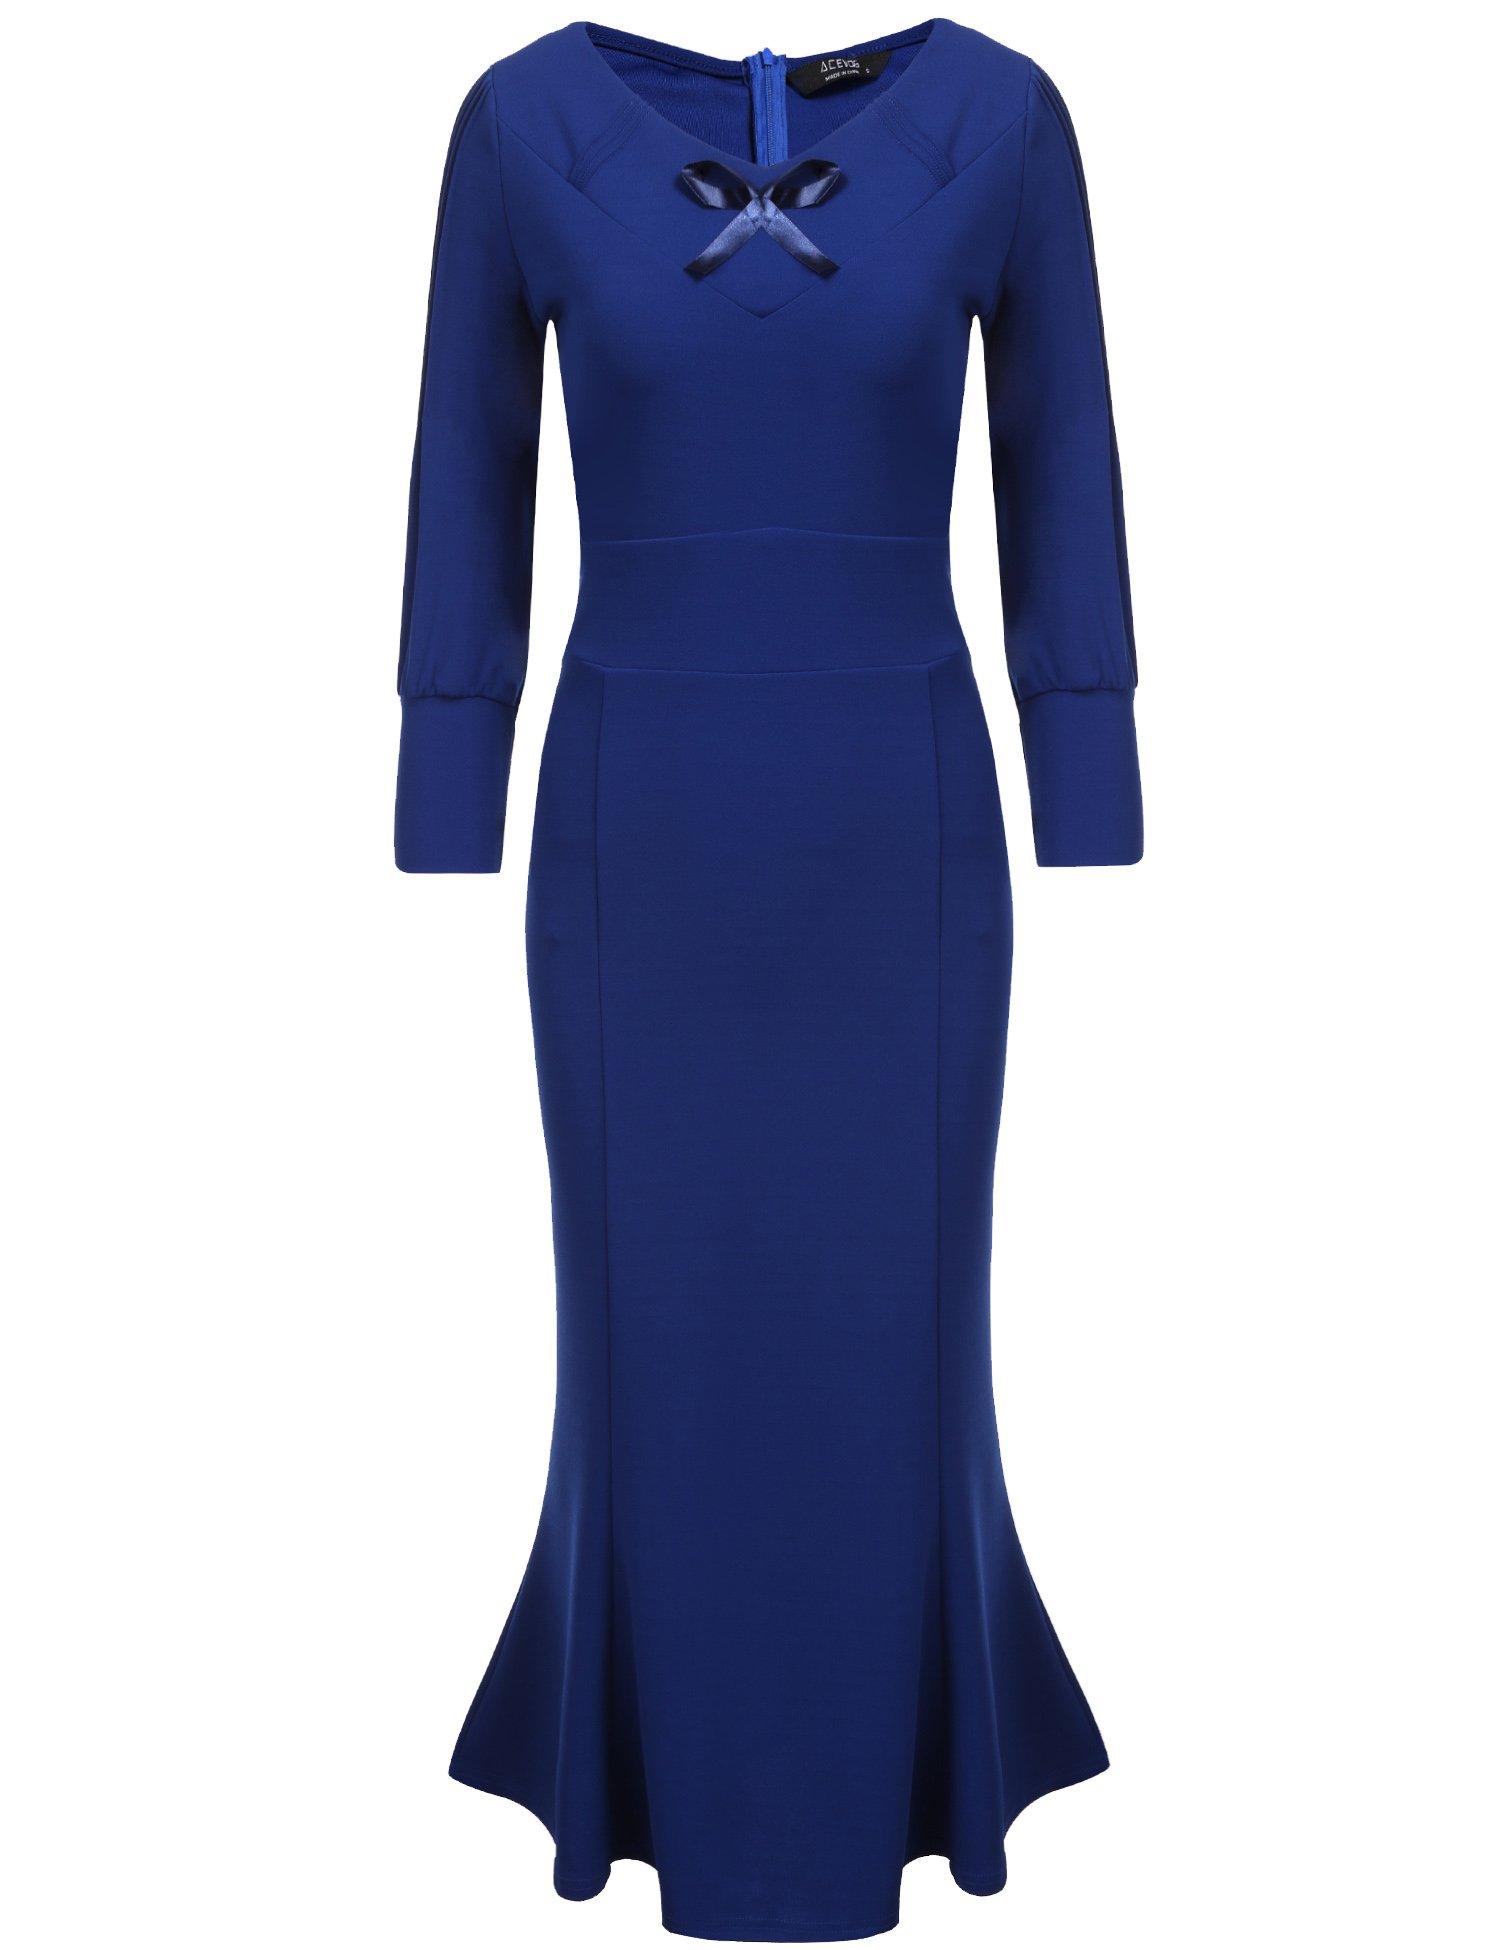 Available at Amazon: ACEVOG Women's Elegant V Neck 3/4 Sleeve Bodycon Fishtail Midi Cocktail Dress